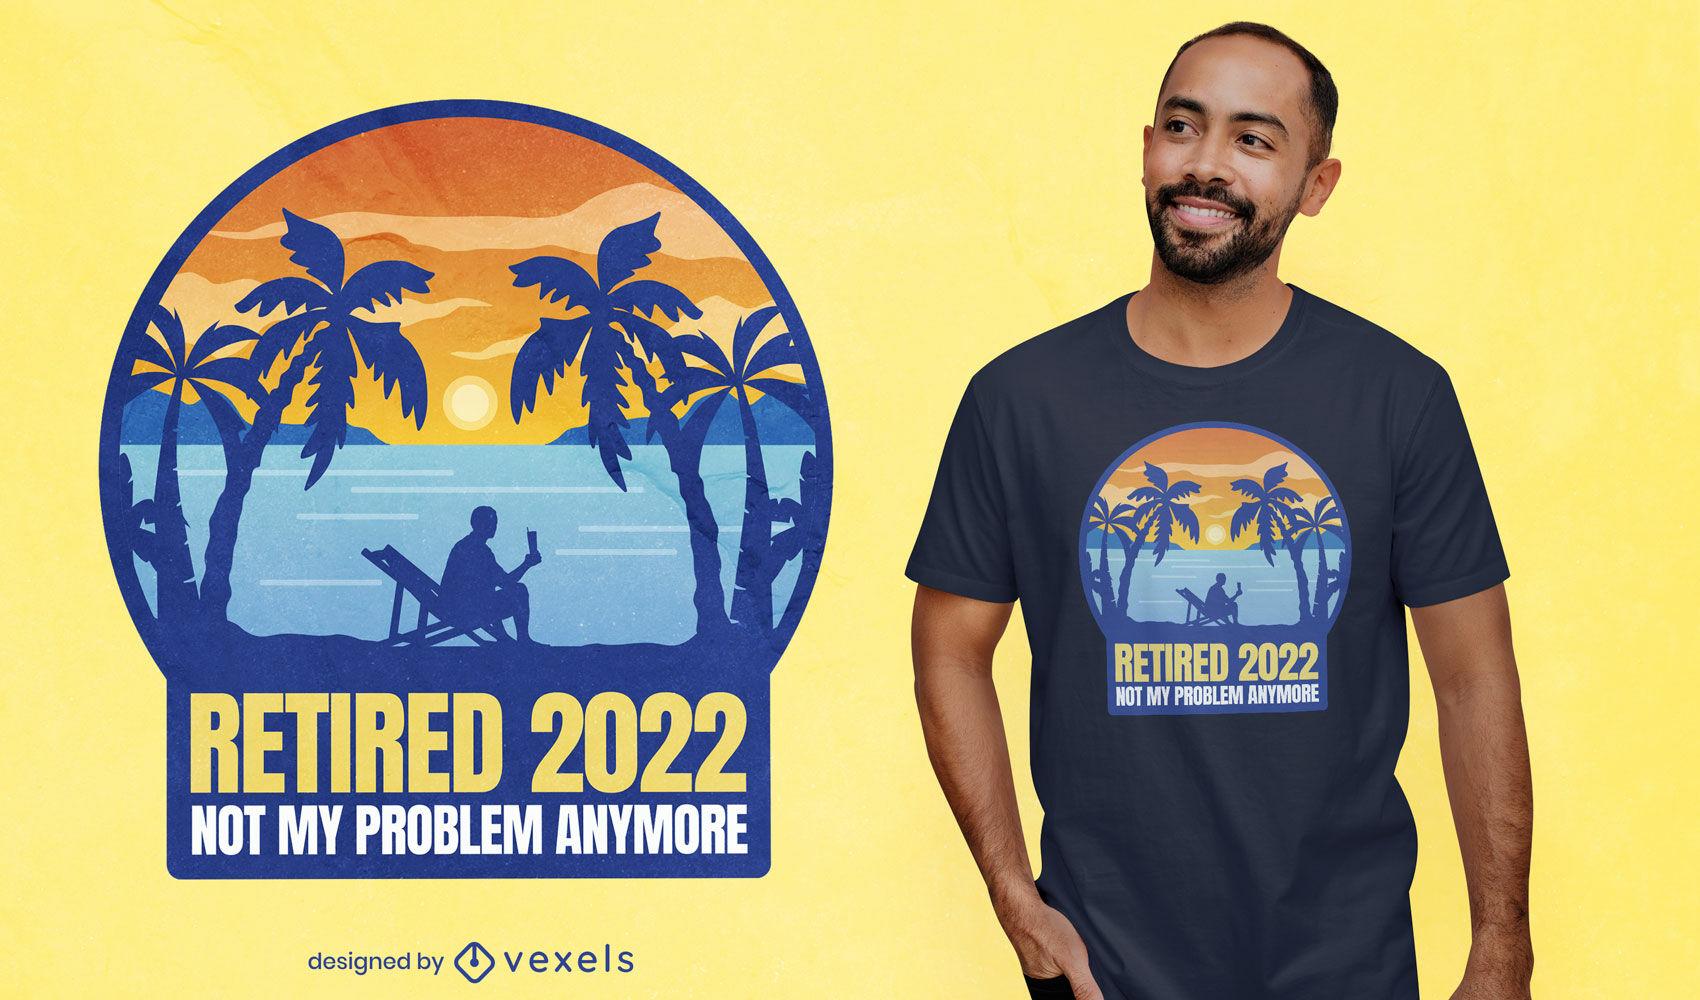 Retired in 2022 beach t-shirt design